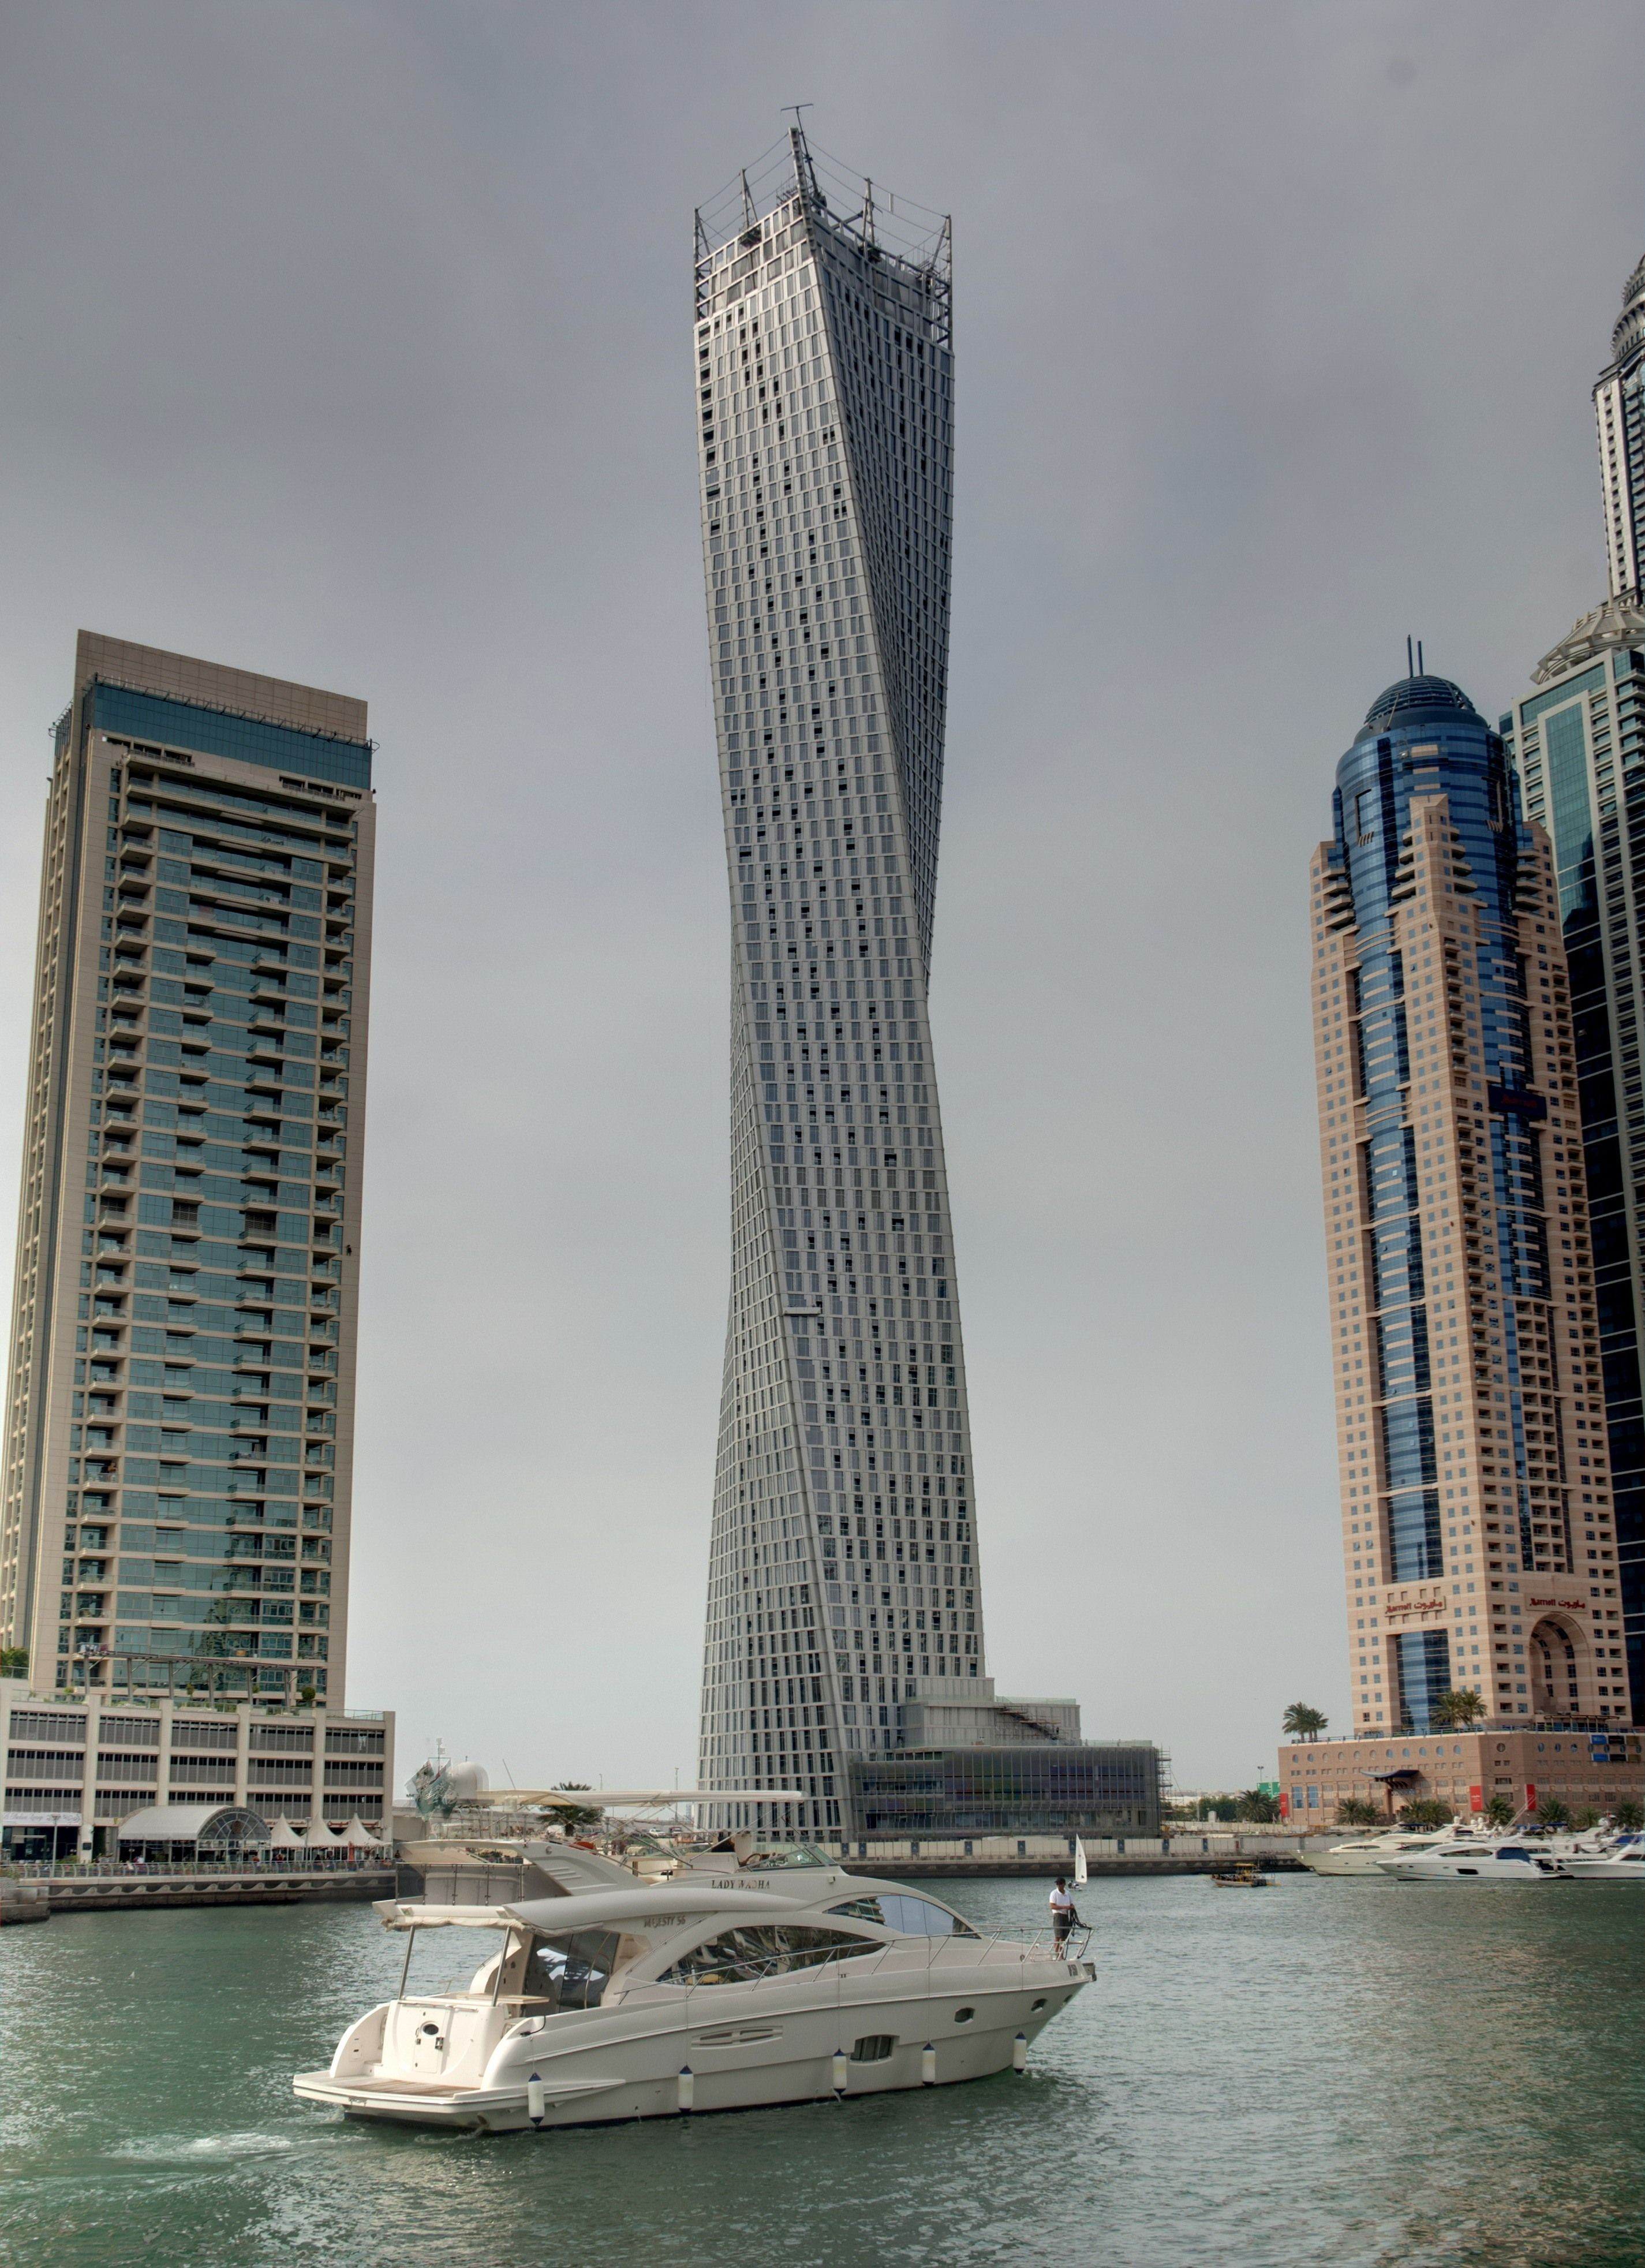 Pin by Osvaldo Gonzalez 😎 11 on Dubai-UAE | Pinterest | Tower, Uae ...